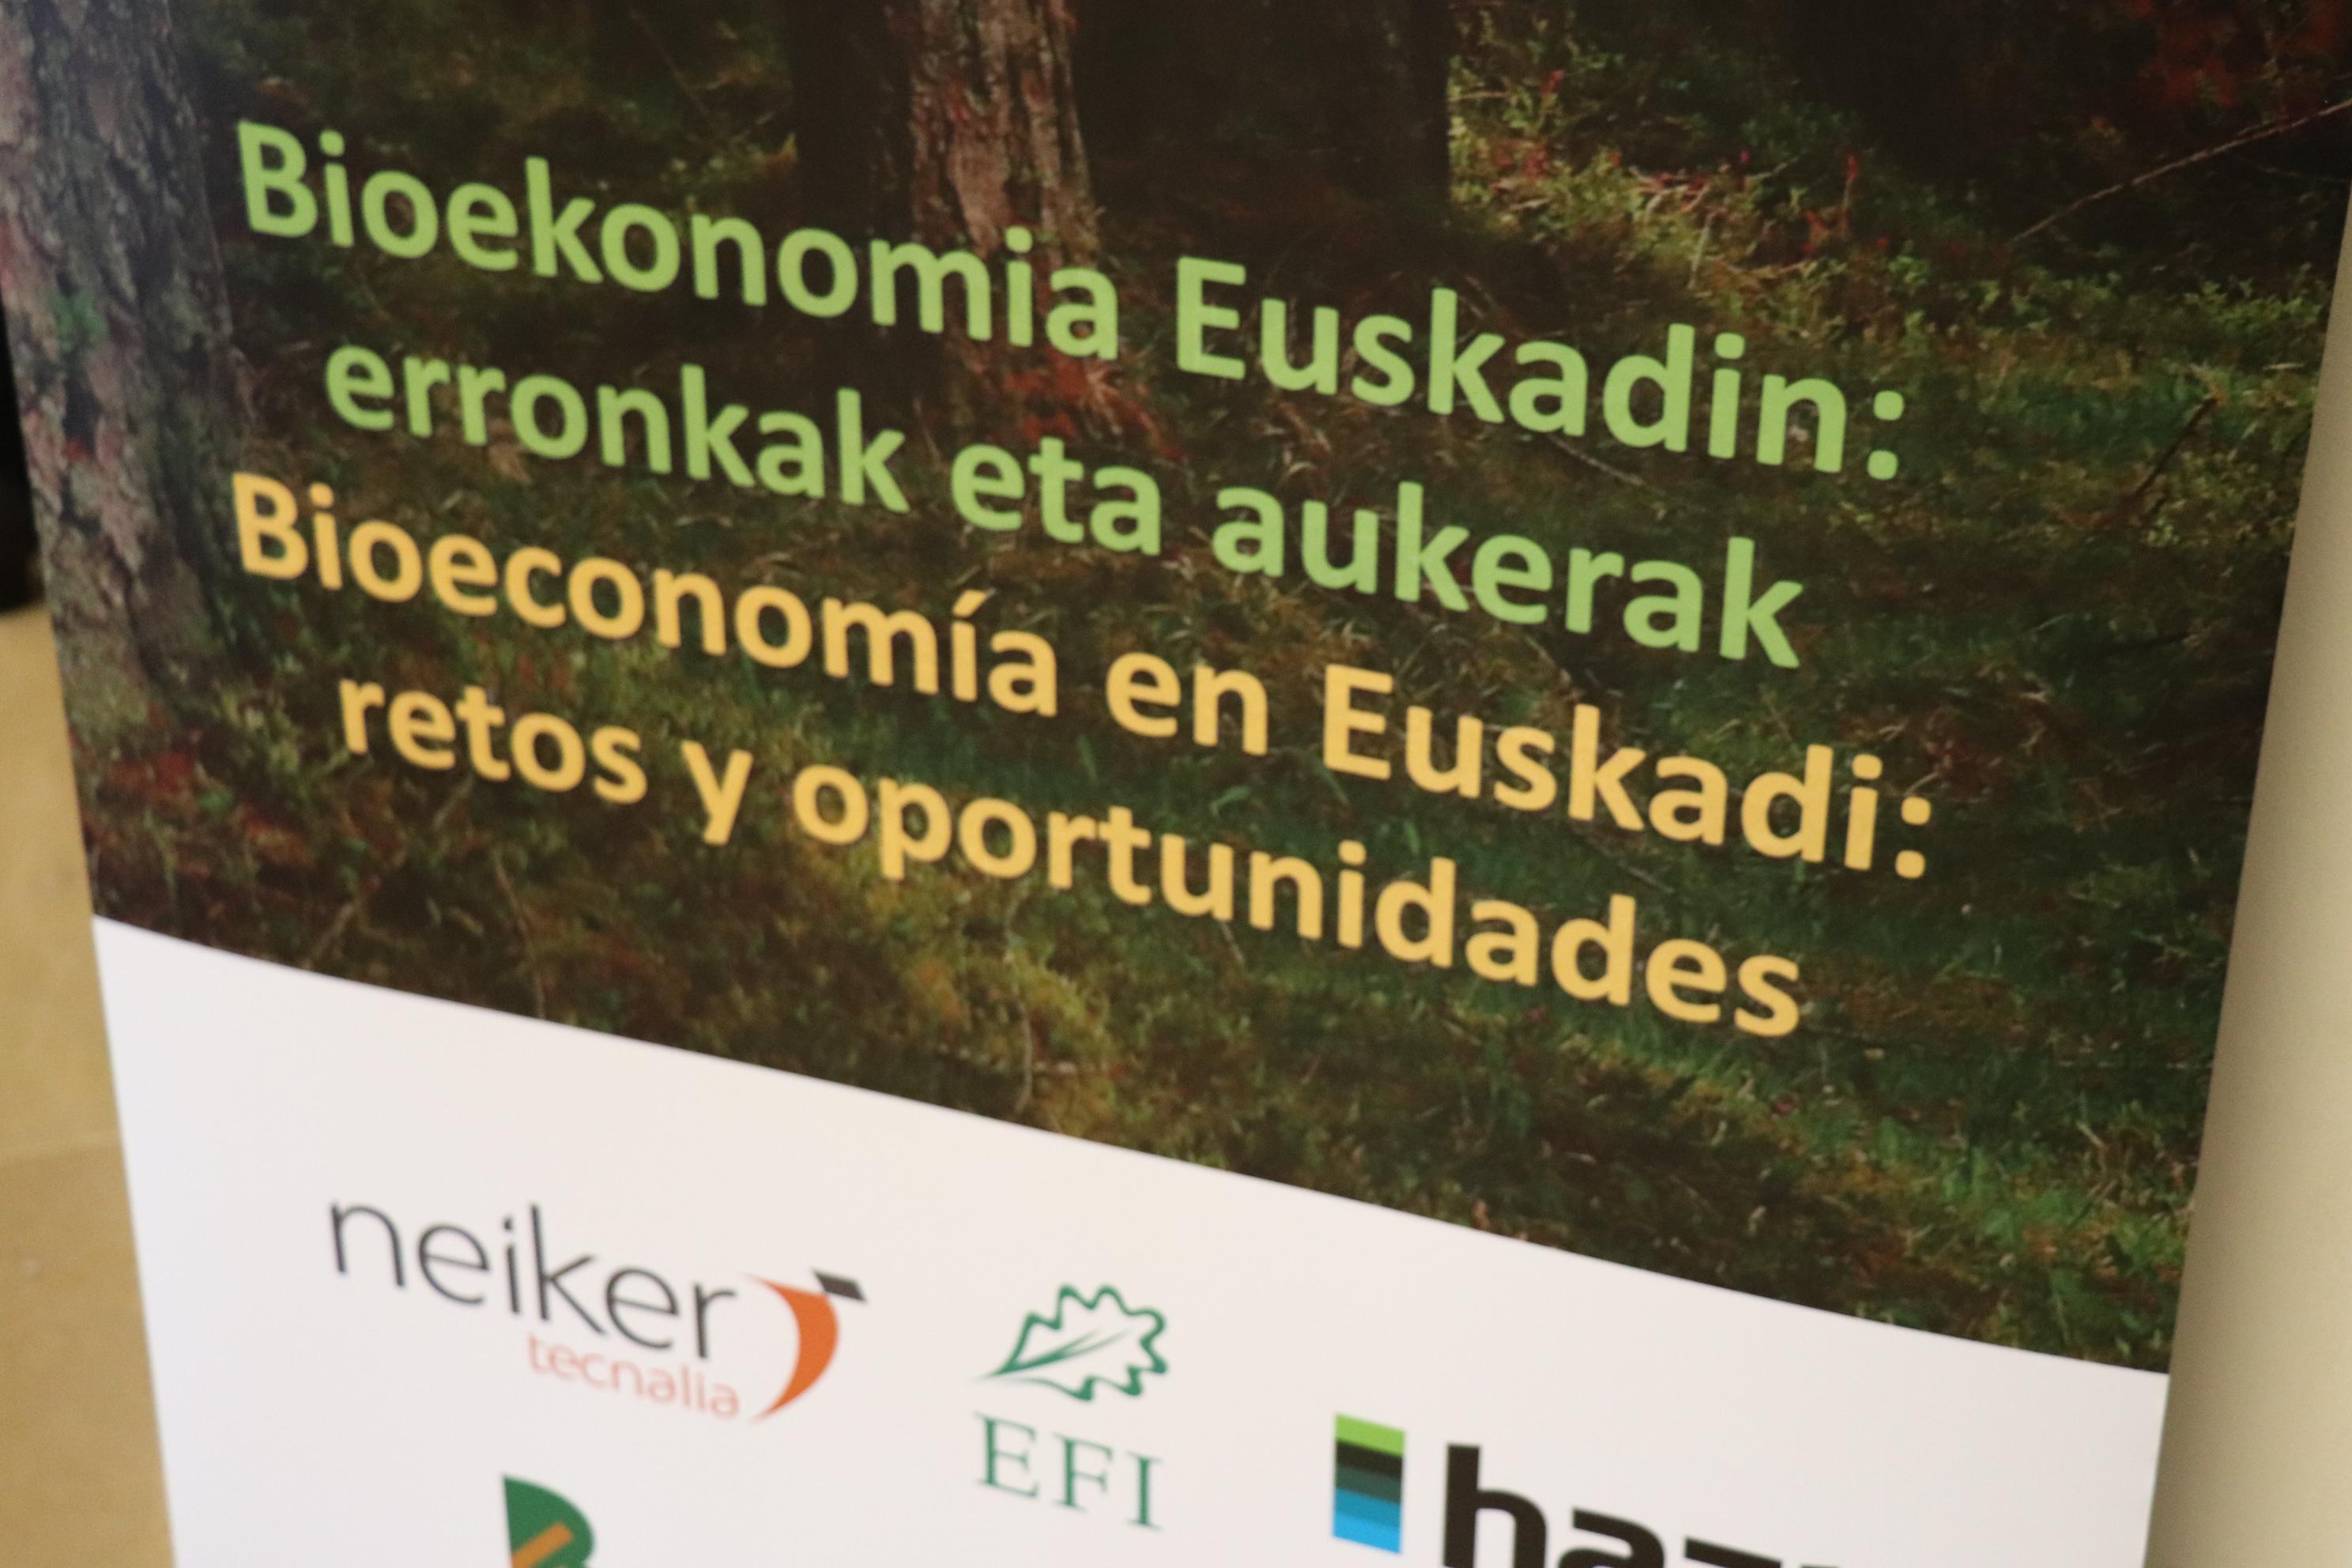 tapia_bioekonomia_08.jpg